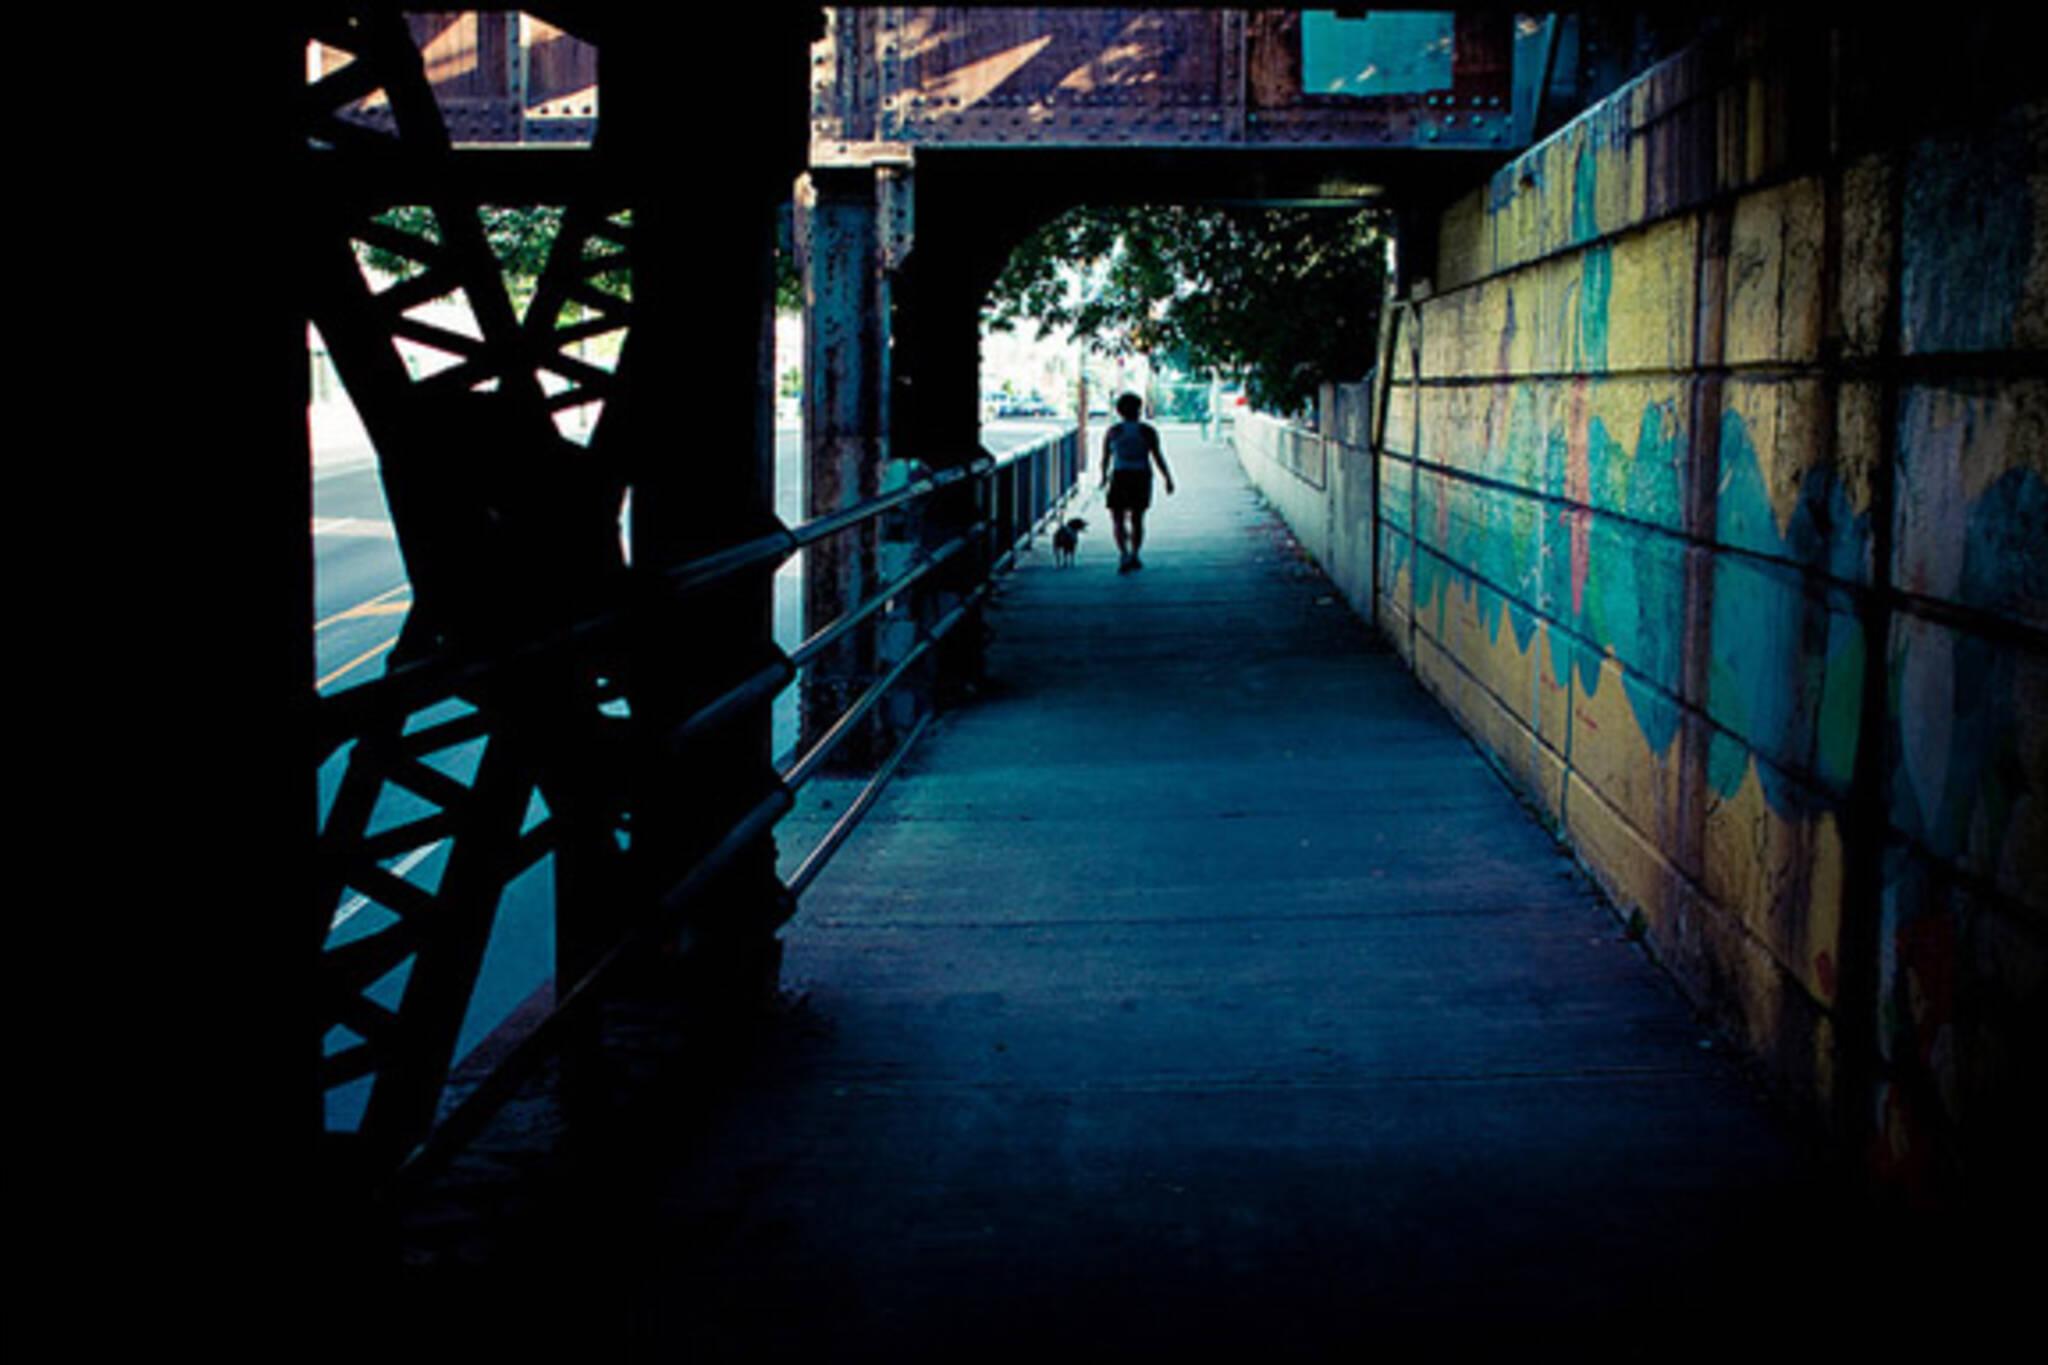 bridge, walk, dog